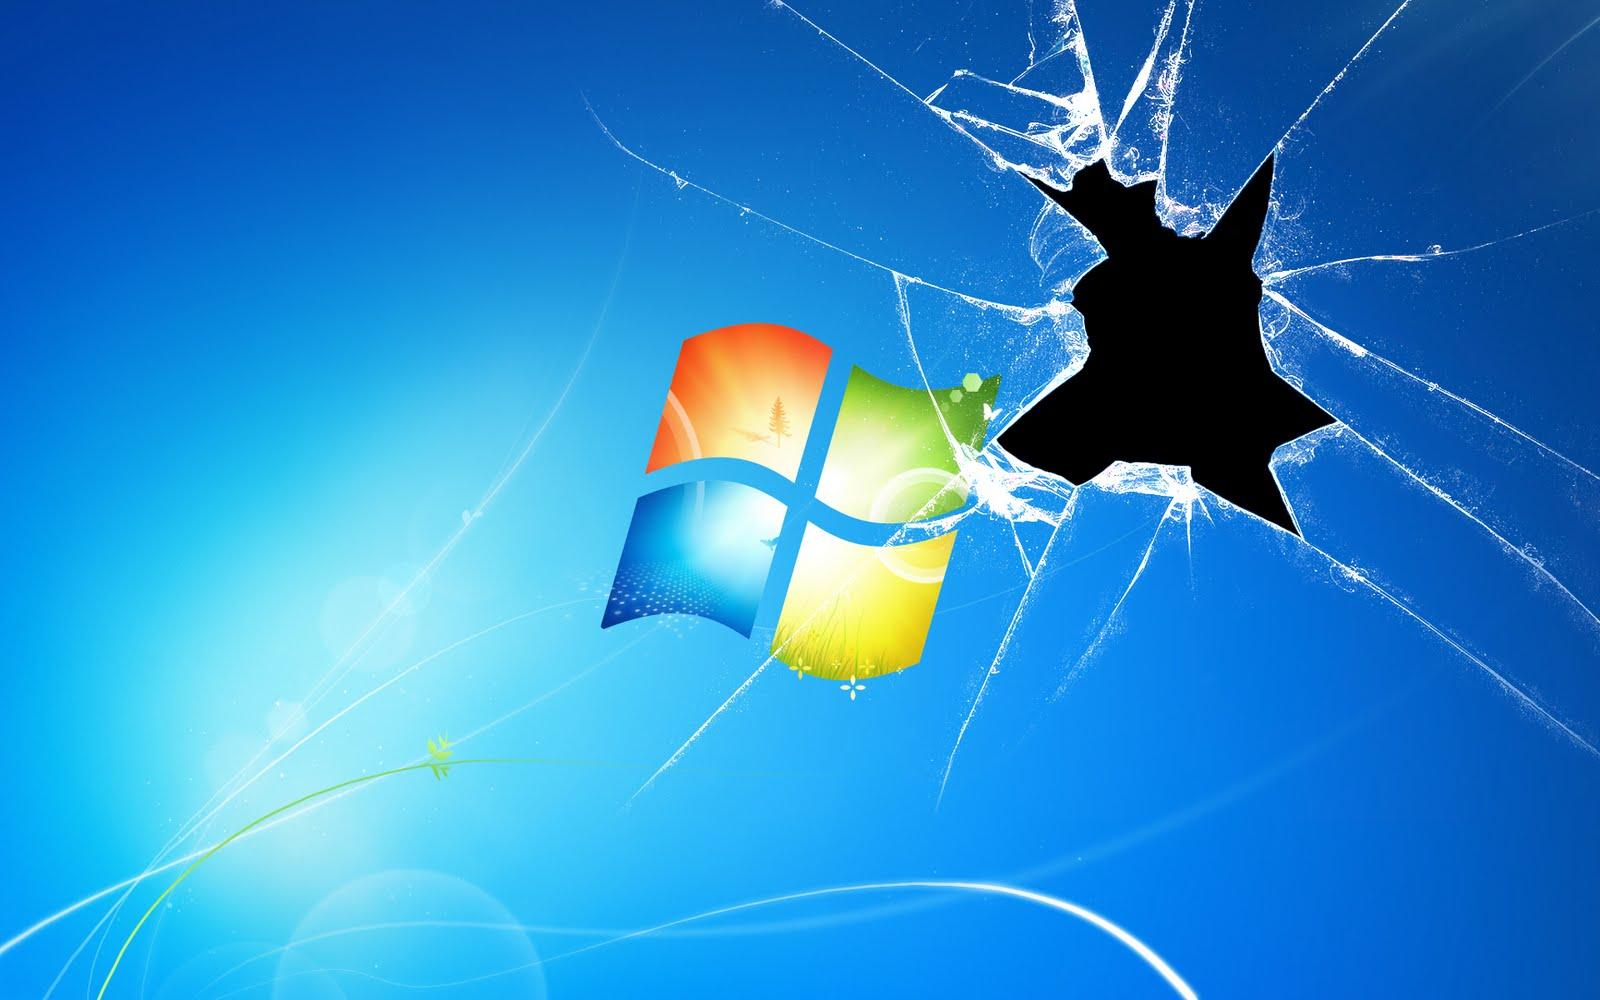 windows 7 broken desktop wallpaper hd windows 7 wallpaper hd windows 7 1600x1000